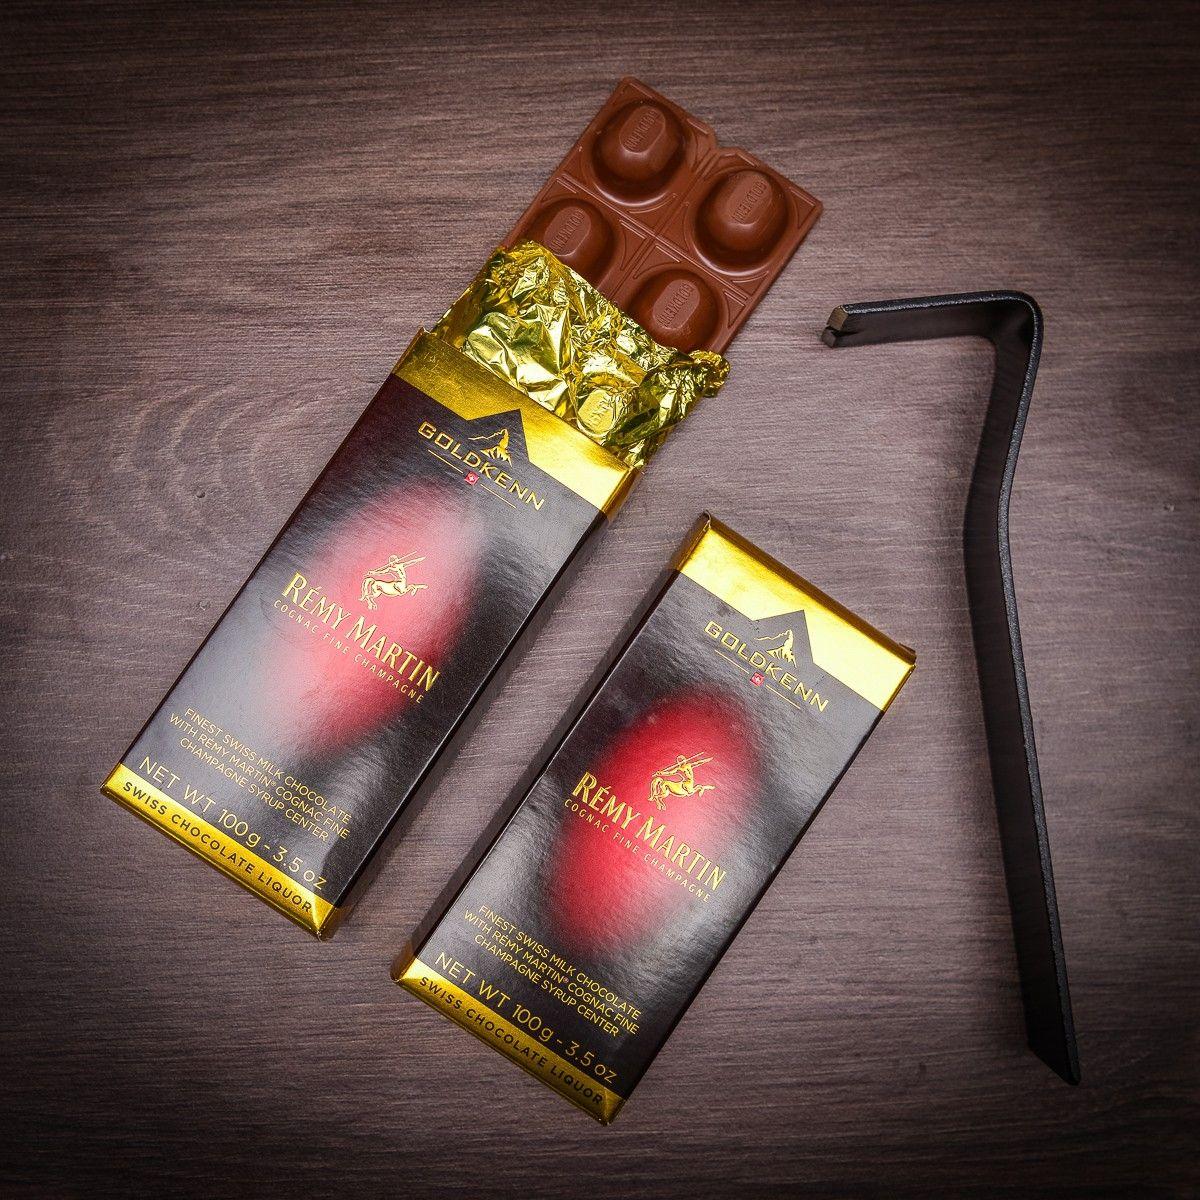 Cokolada Goldkenn Remy Martin.jpg